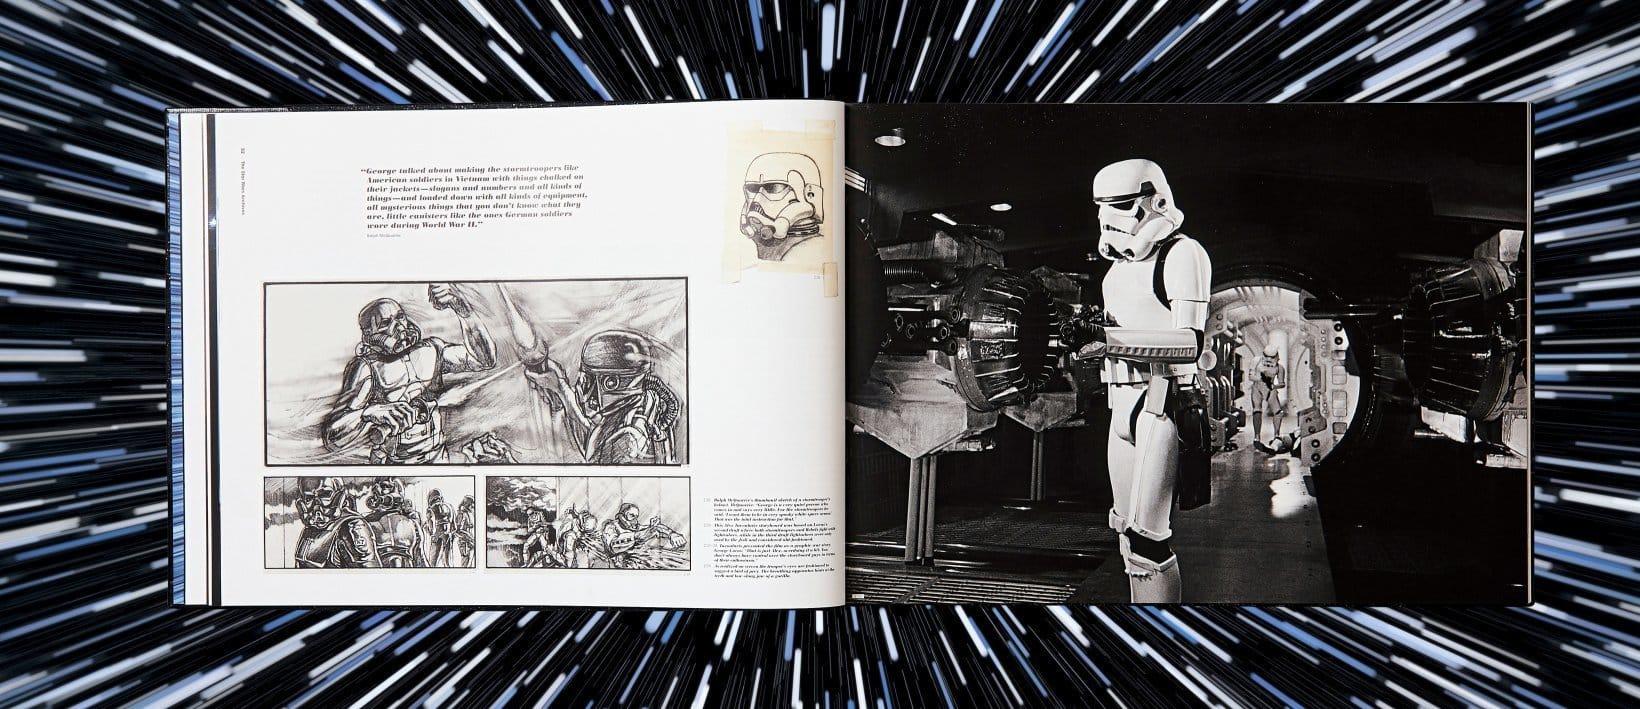 archivos de star wars storm trooper detalles oldskull